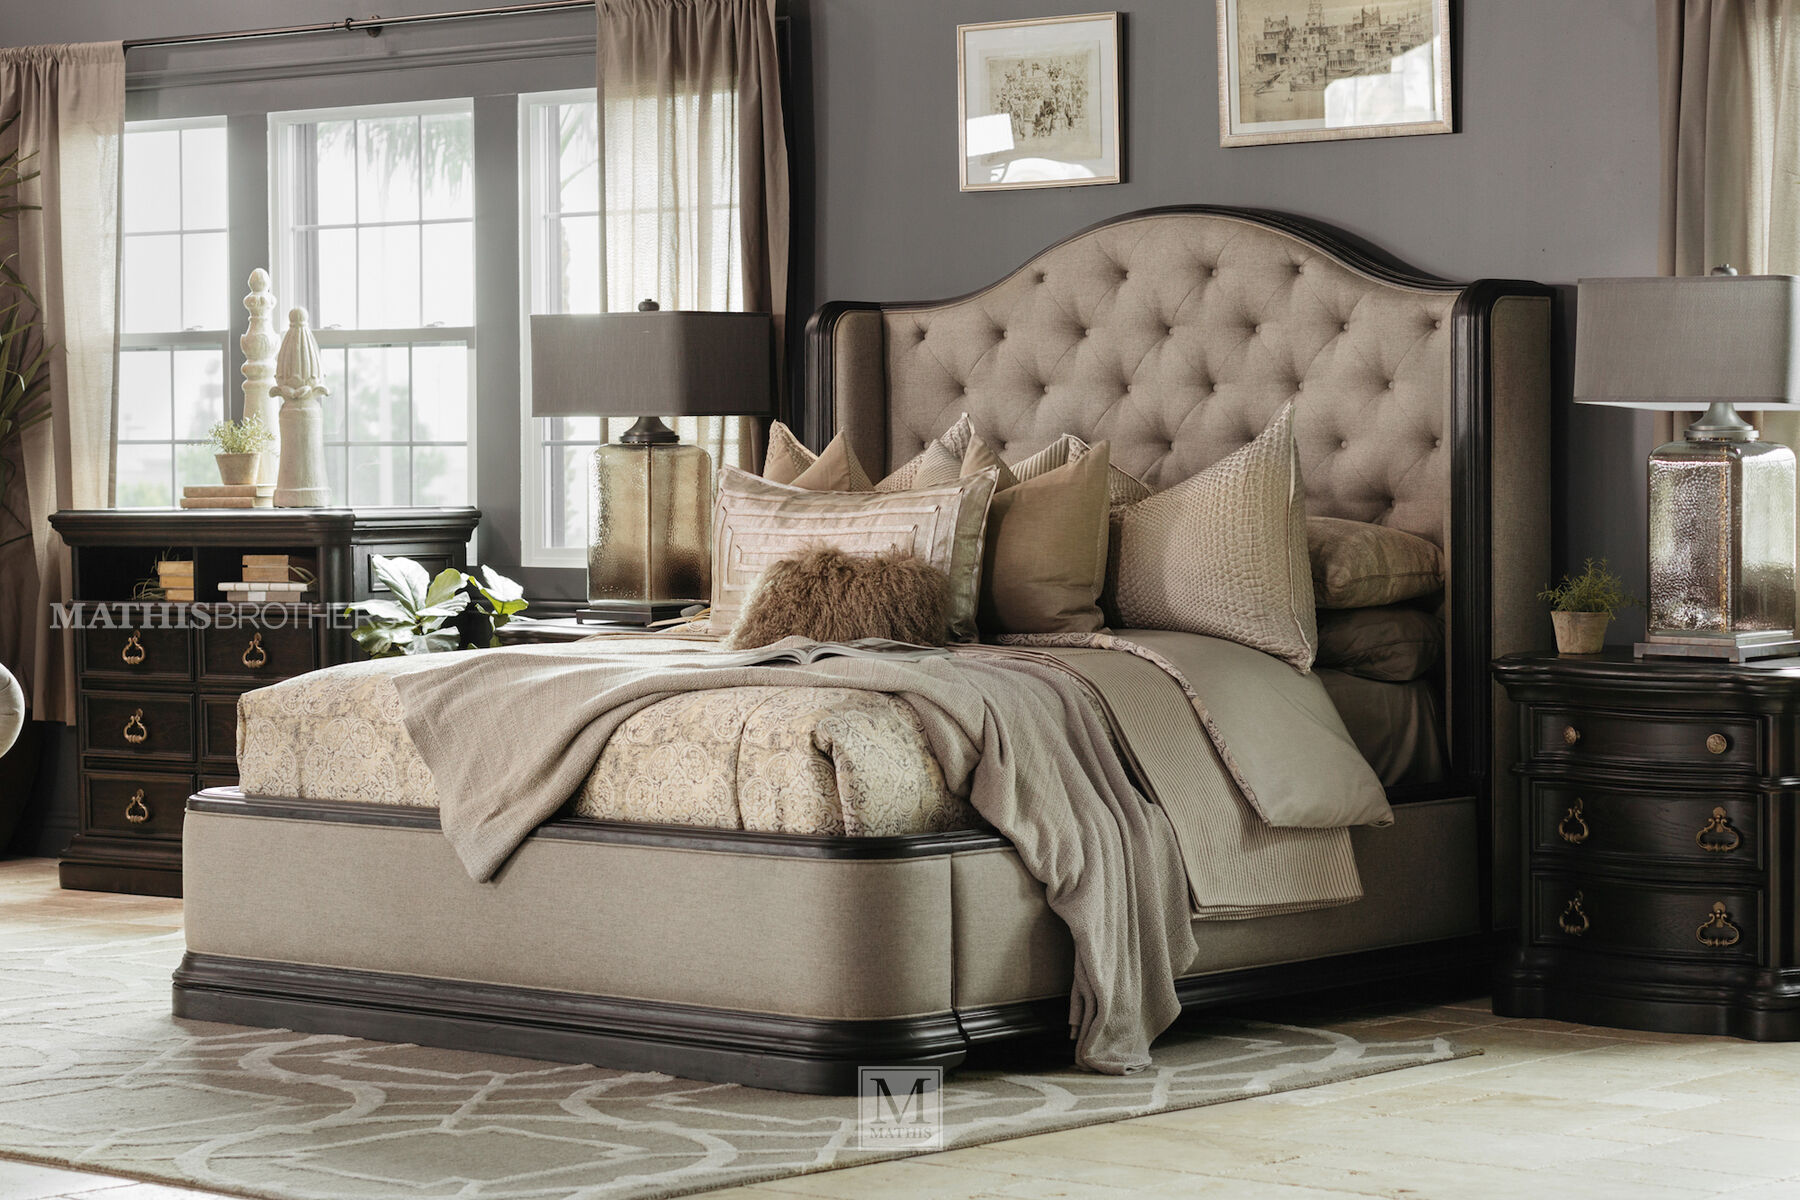 Impressive Luxury Bedroom Sets Collection